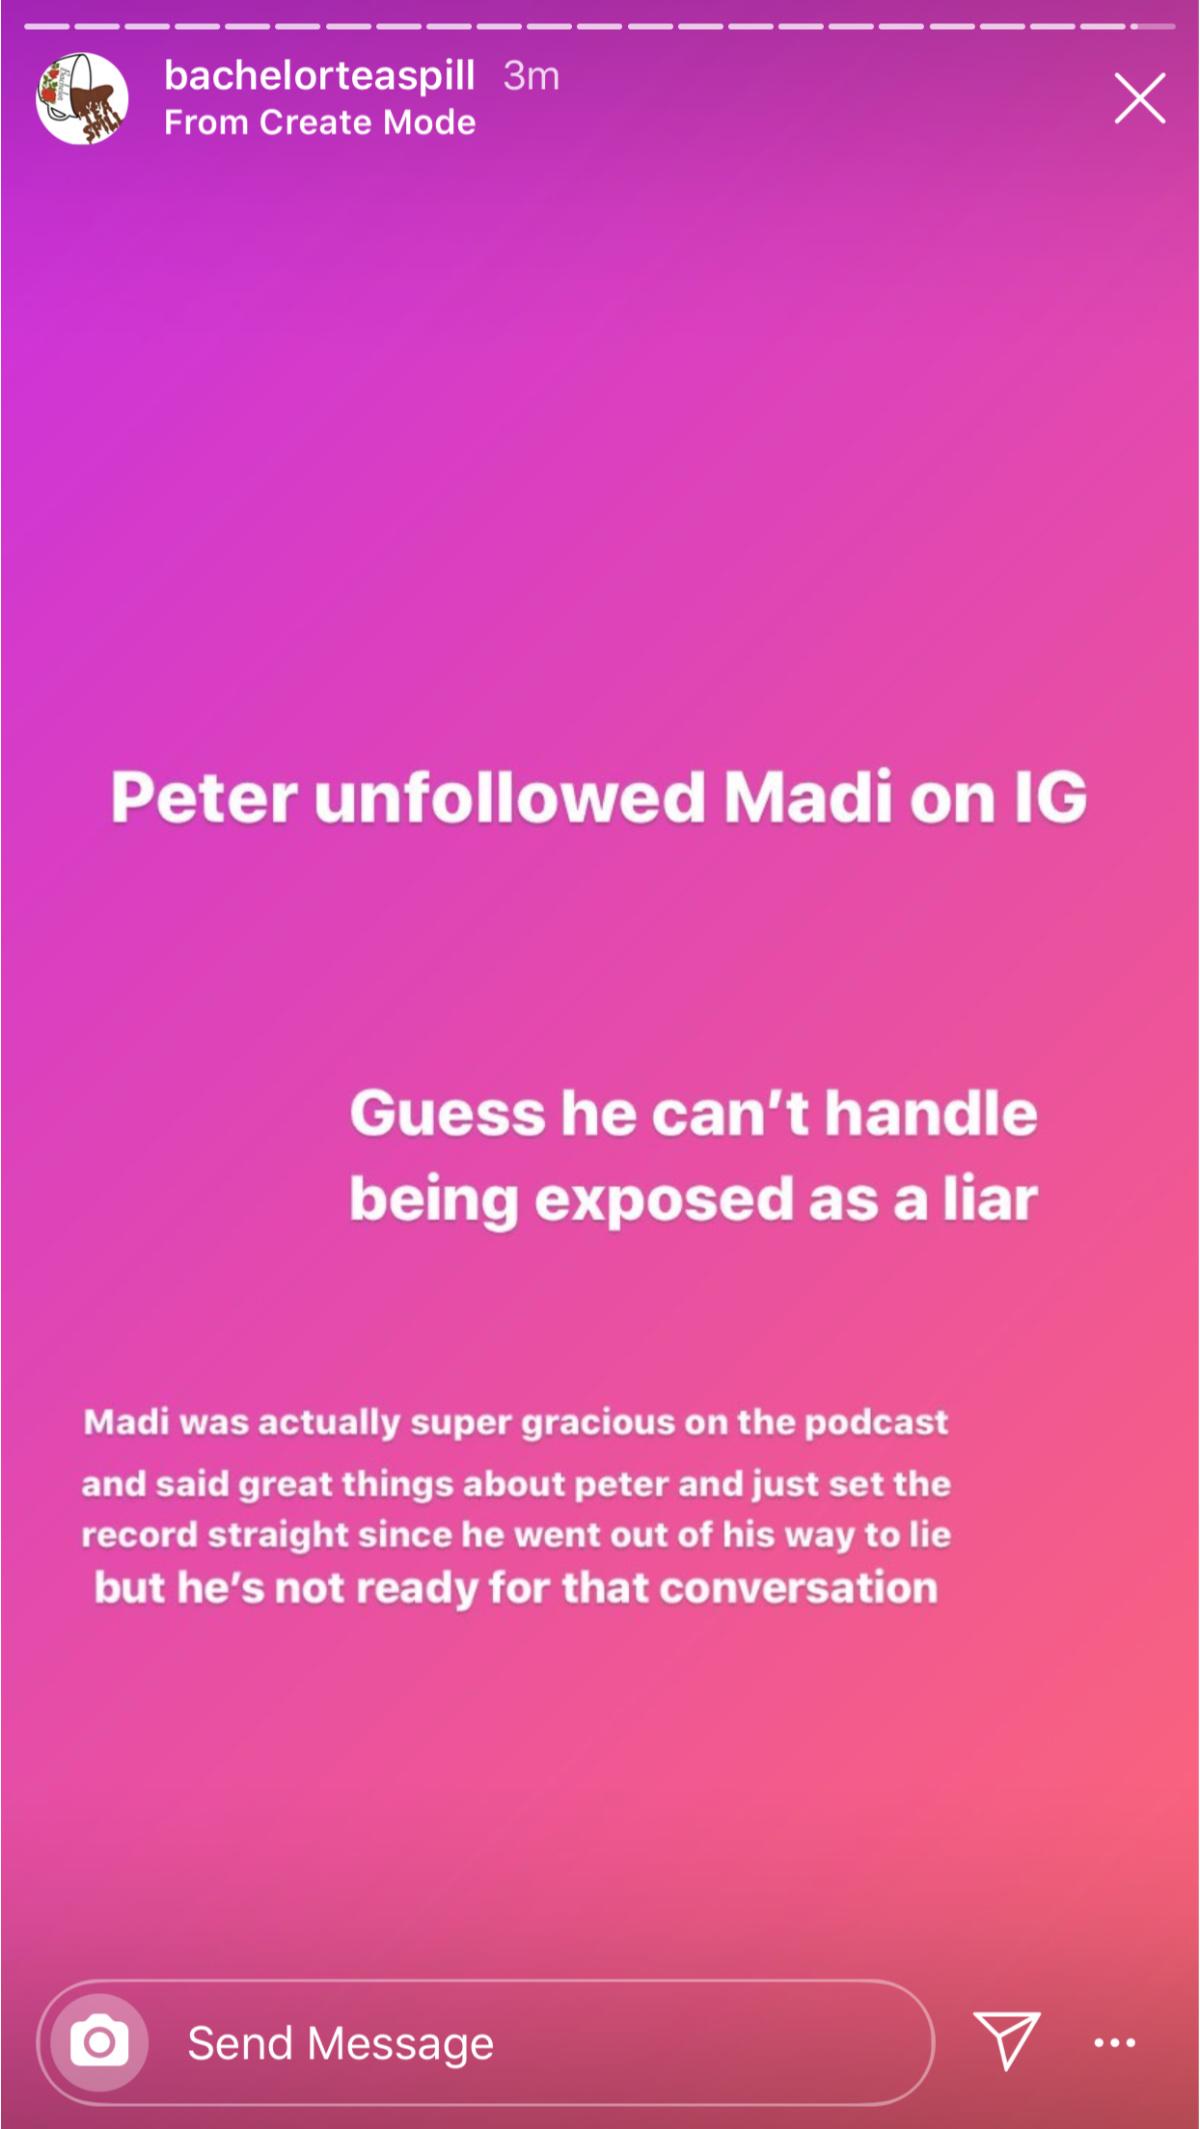 Peter unfollows Madi